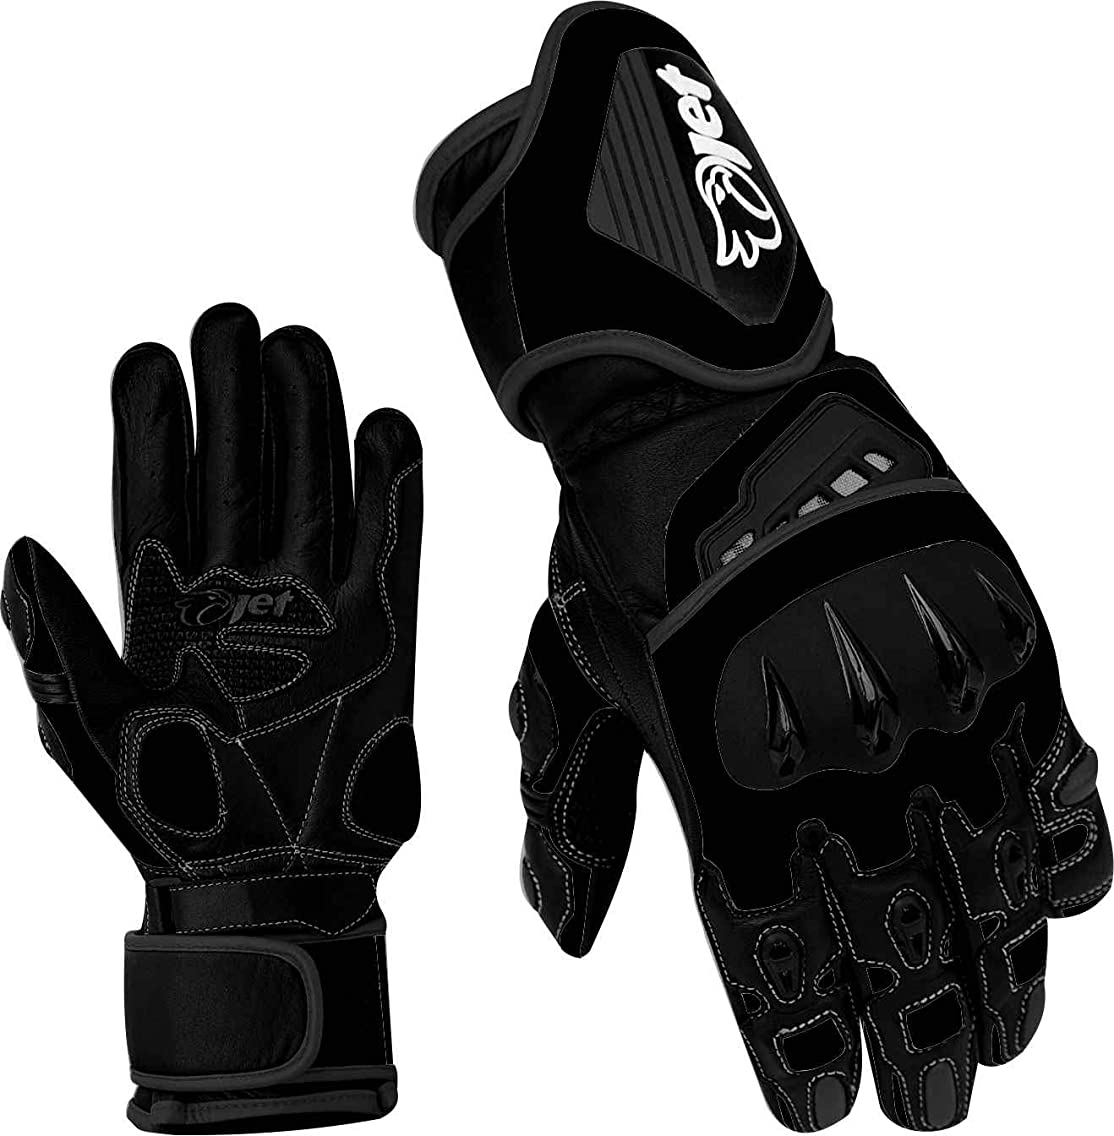 JET Motorcycle Gloves Premium Full Leather Gauntlet Race Hard Knuckle Gloves (Large, Full Black)